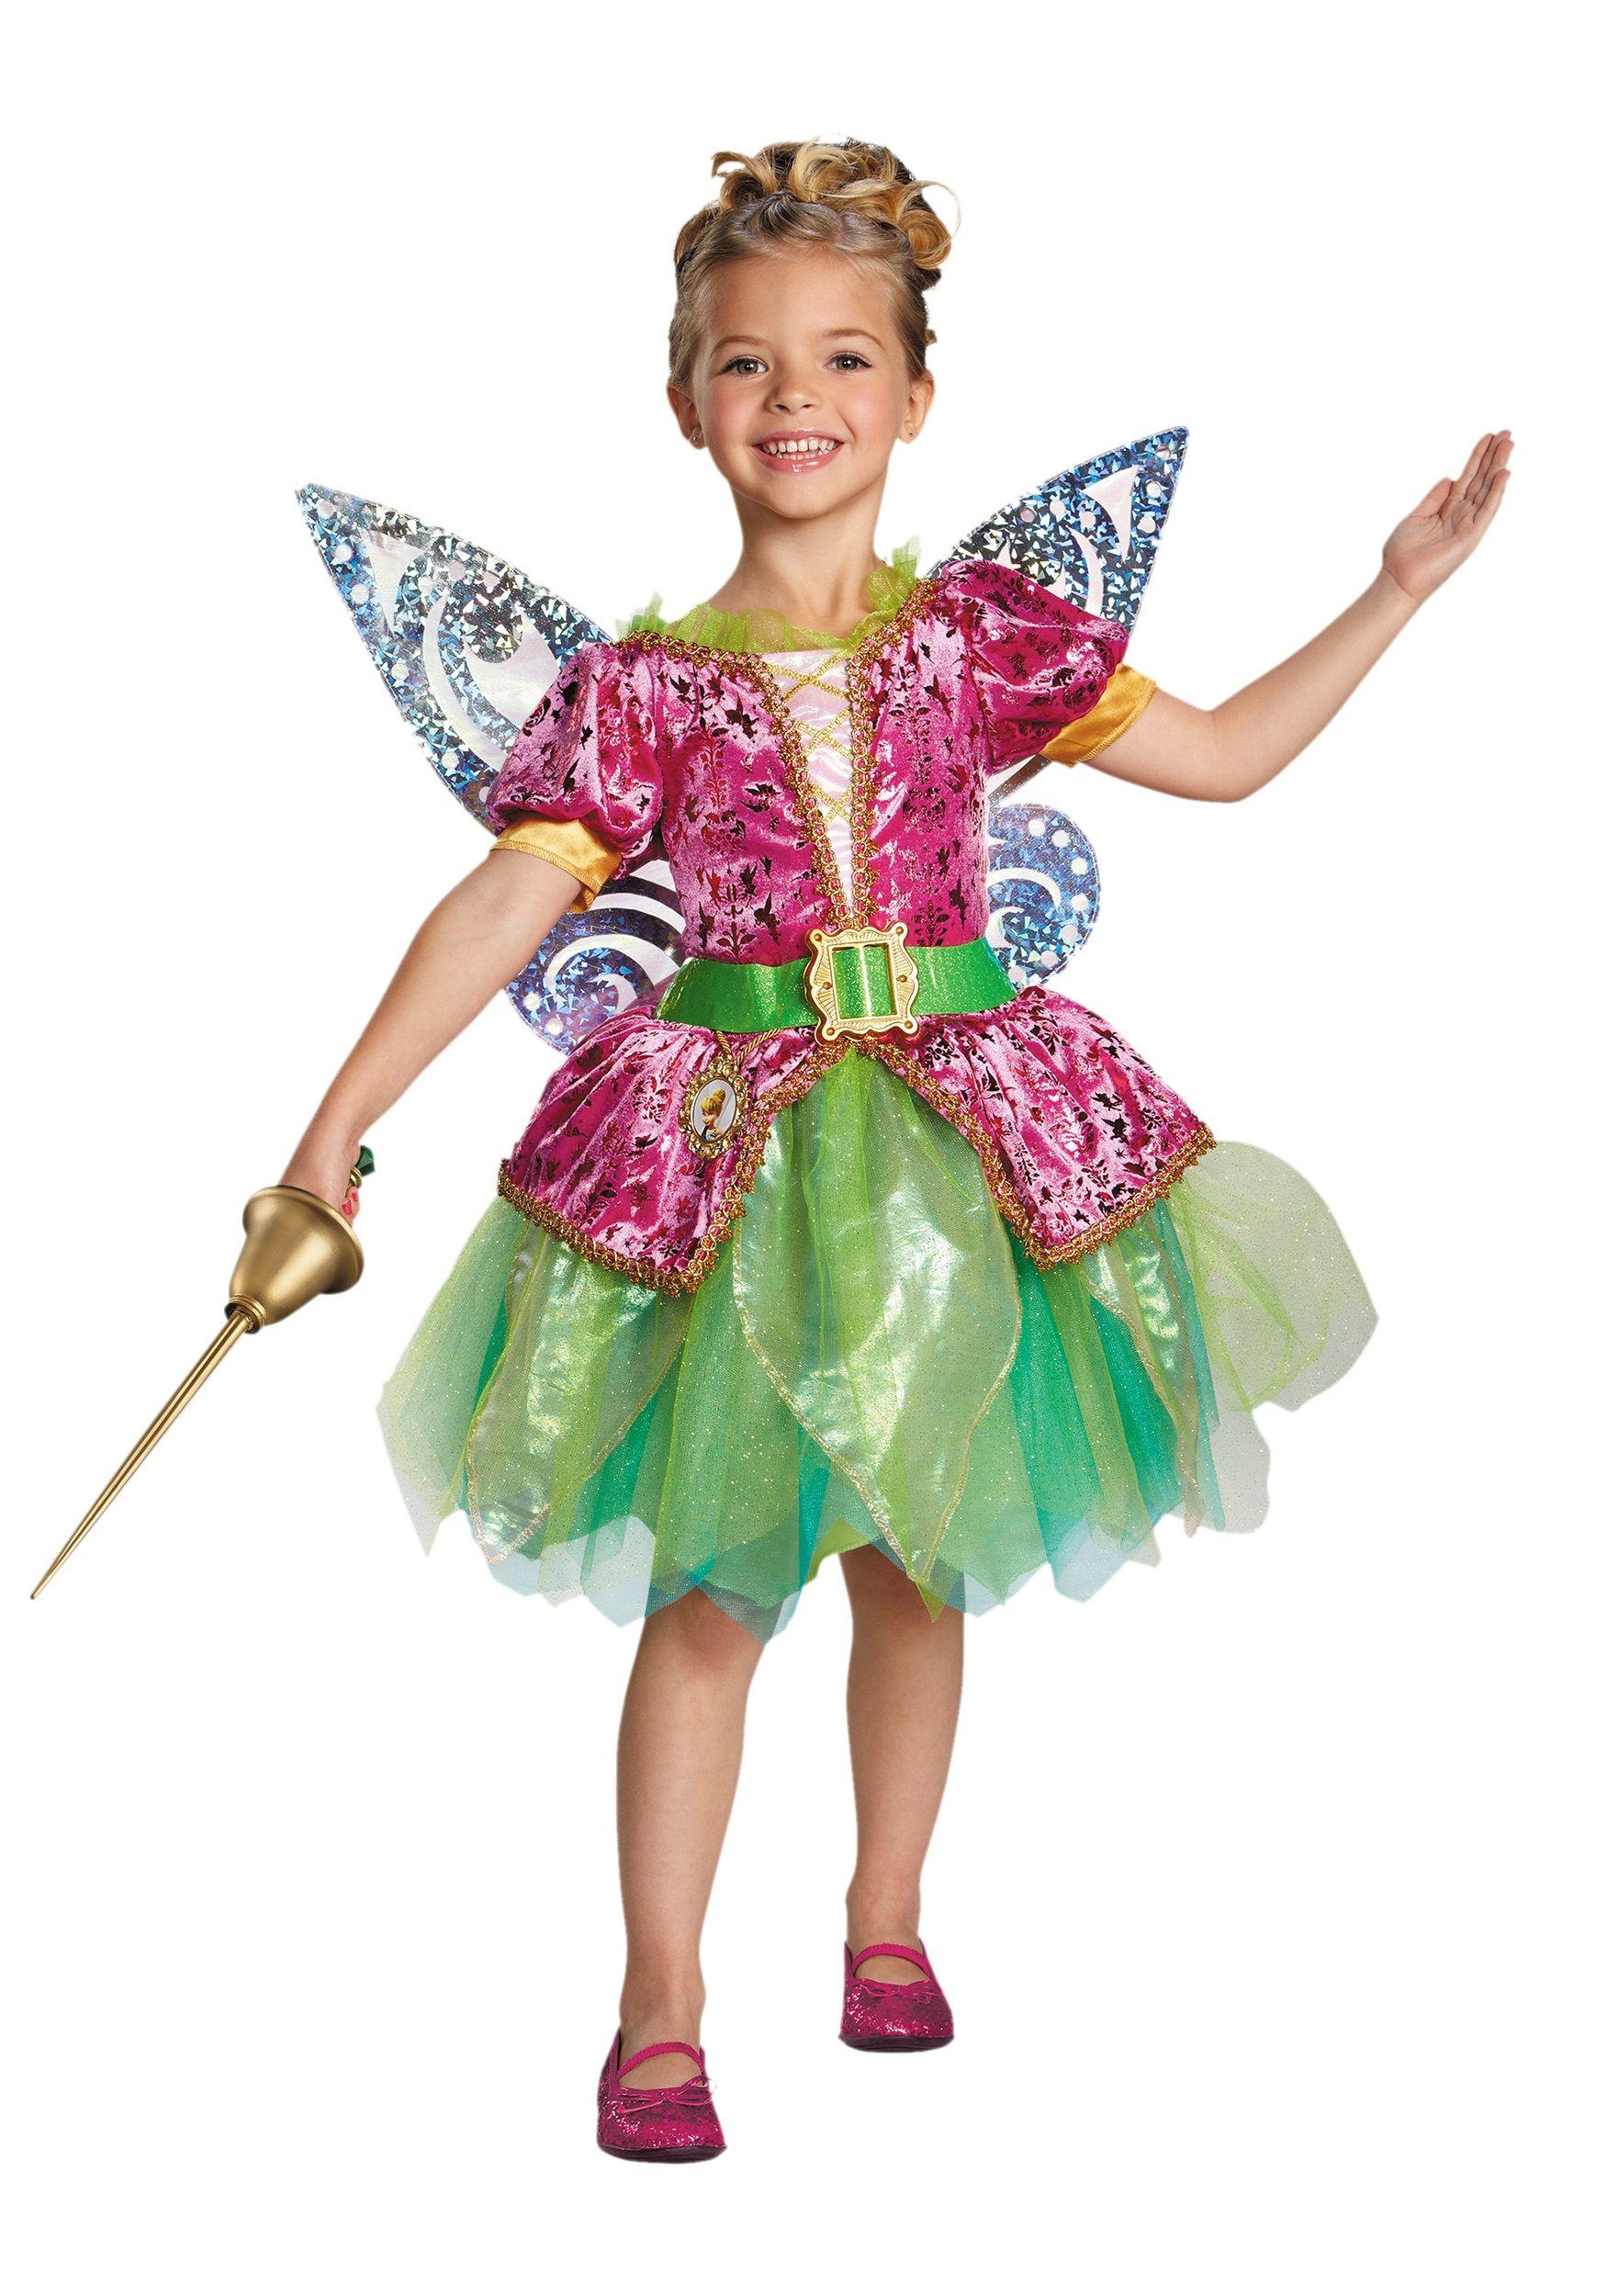 Child Pirate Costumes - Kids Boys, Girls Pirate Halloween Costume ...